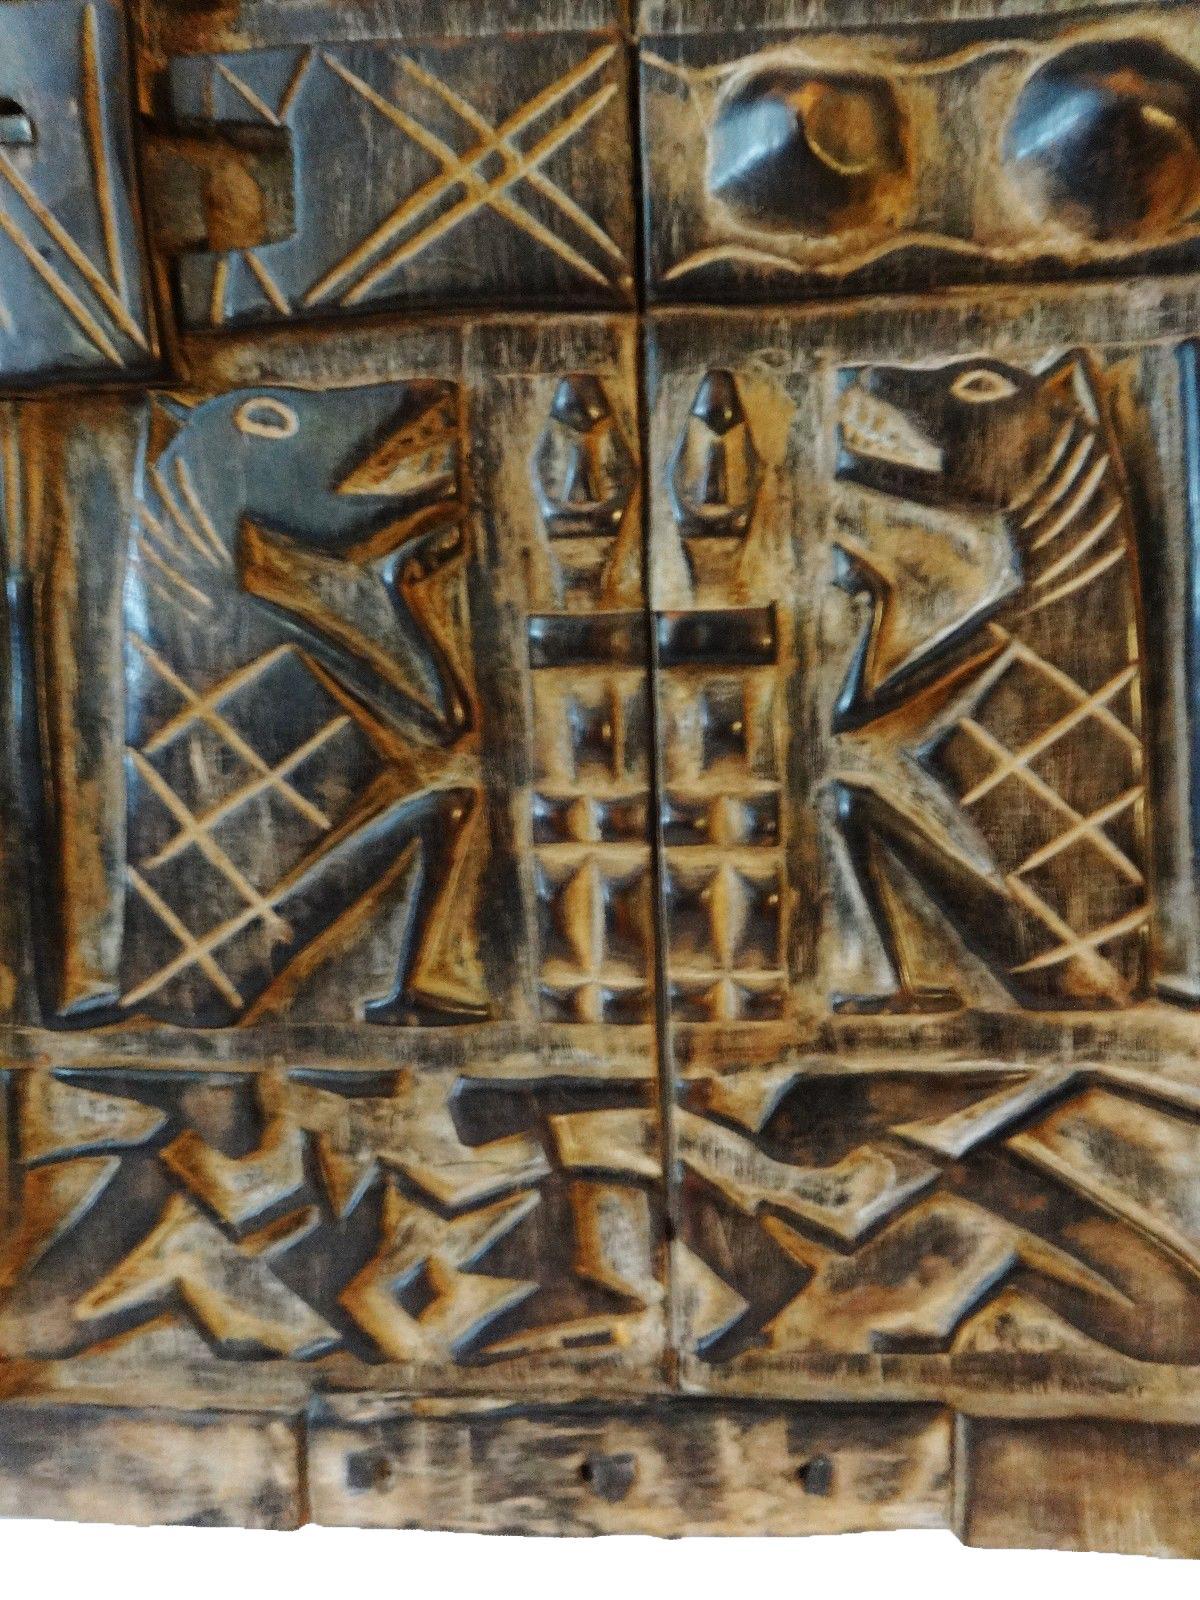 Mali African Dogon Door with Figures - Image 3 of 6  sc 1 st  Chairish & Mali African Dogon Door with Figures | Chairish